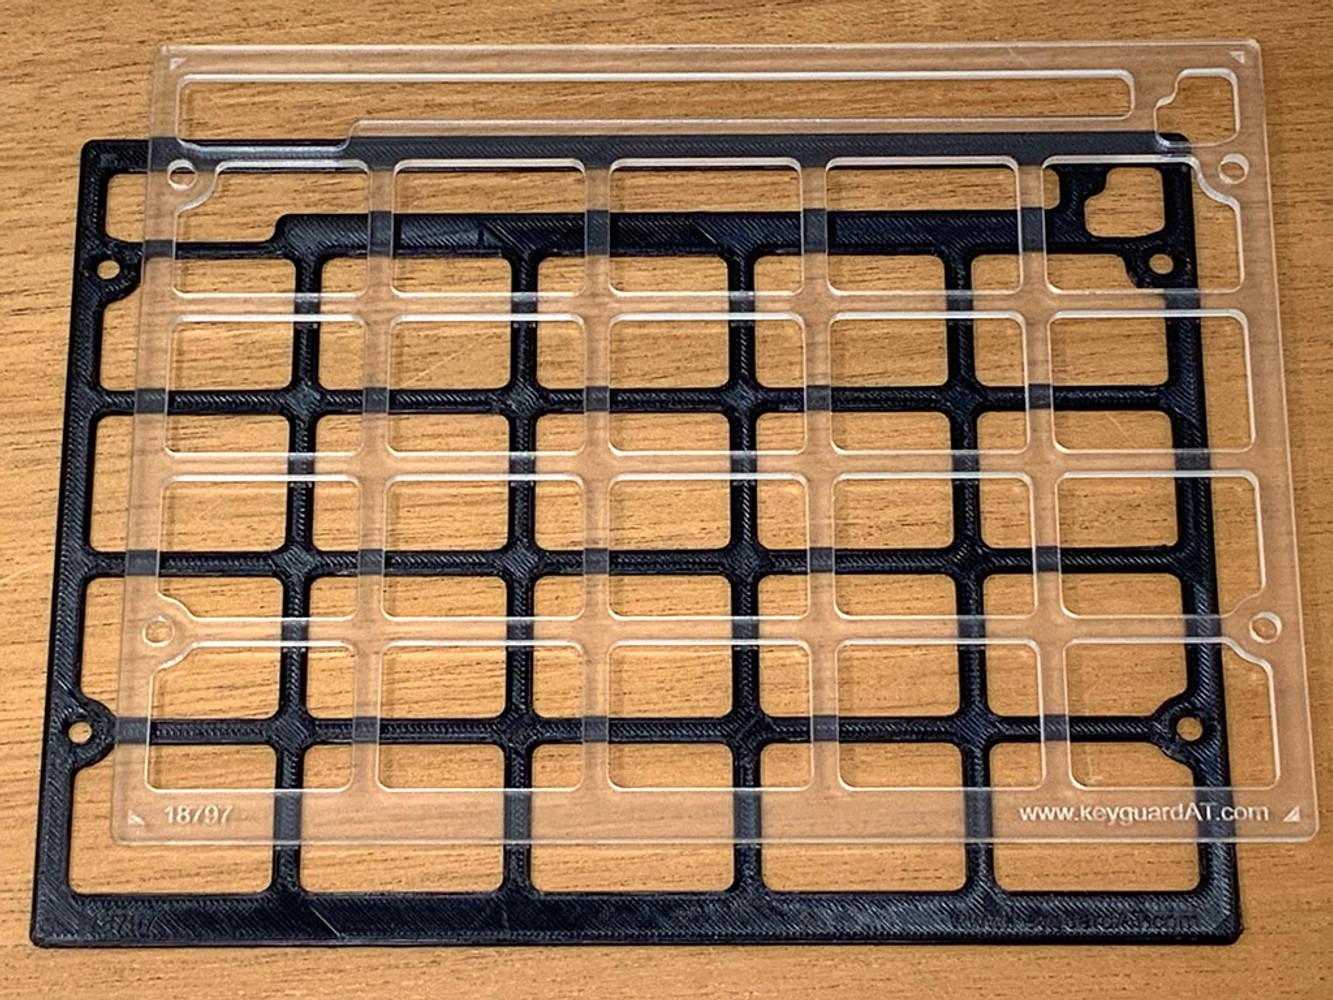 Keyguard Materials